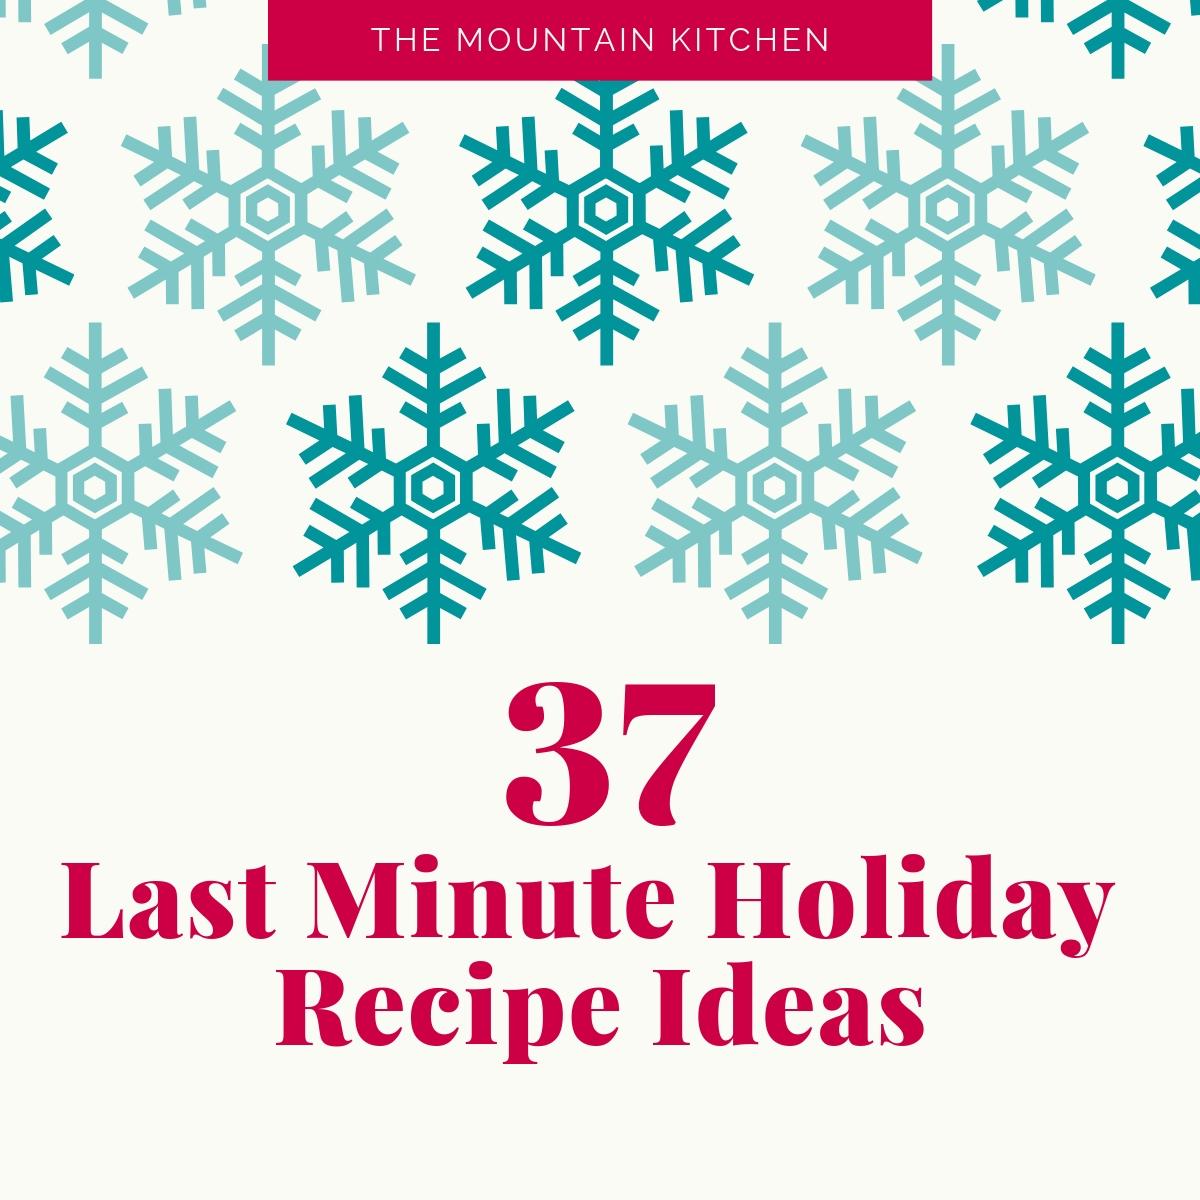 37 Last Minute Holiday Recipe Ideas